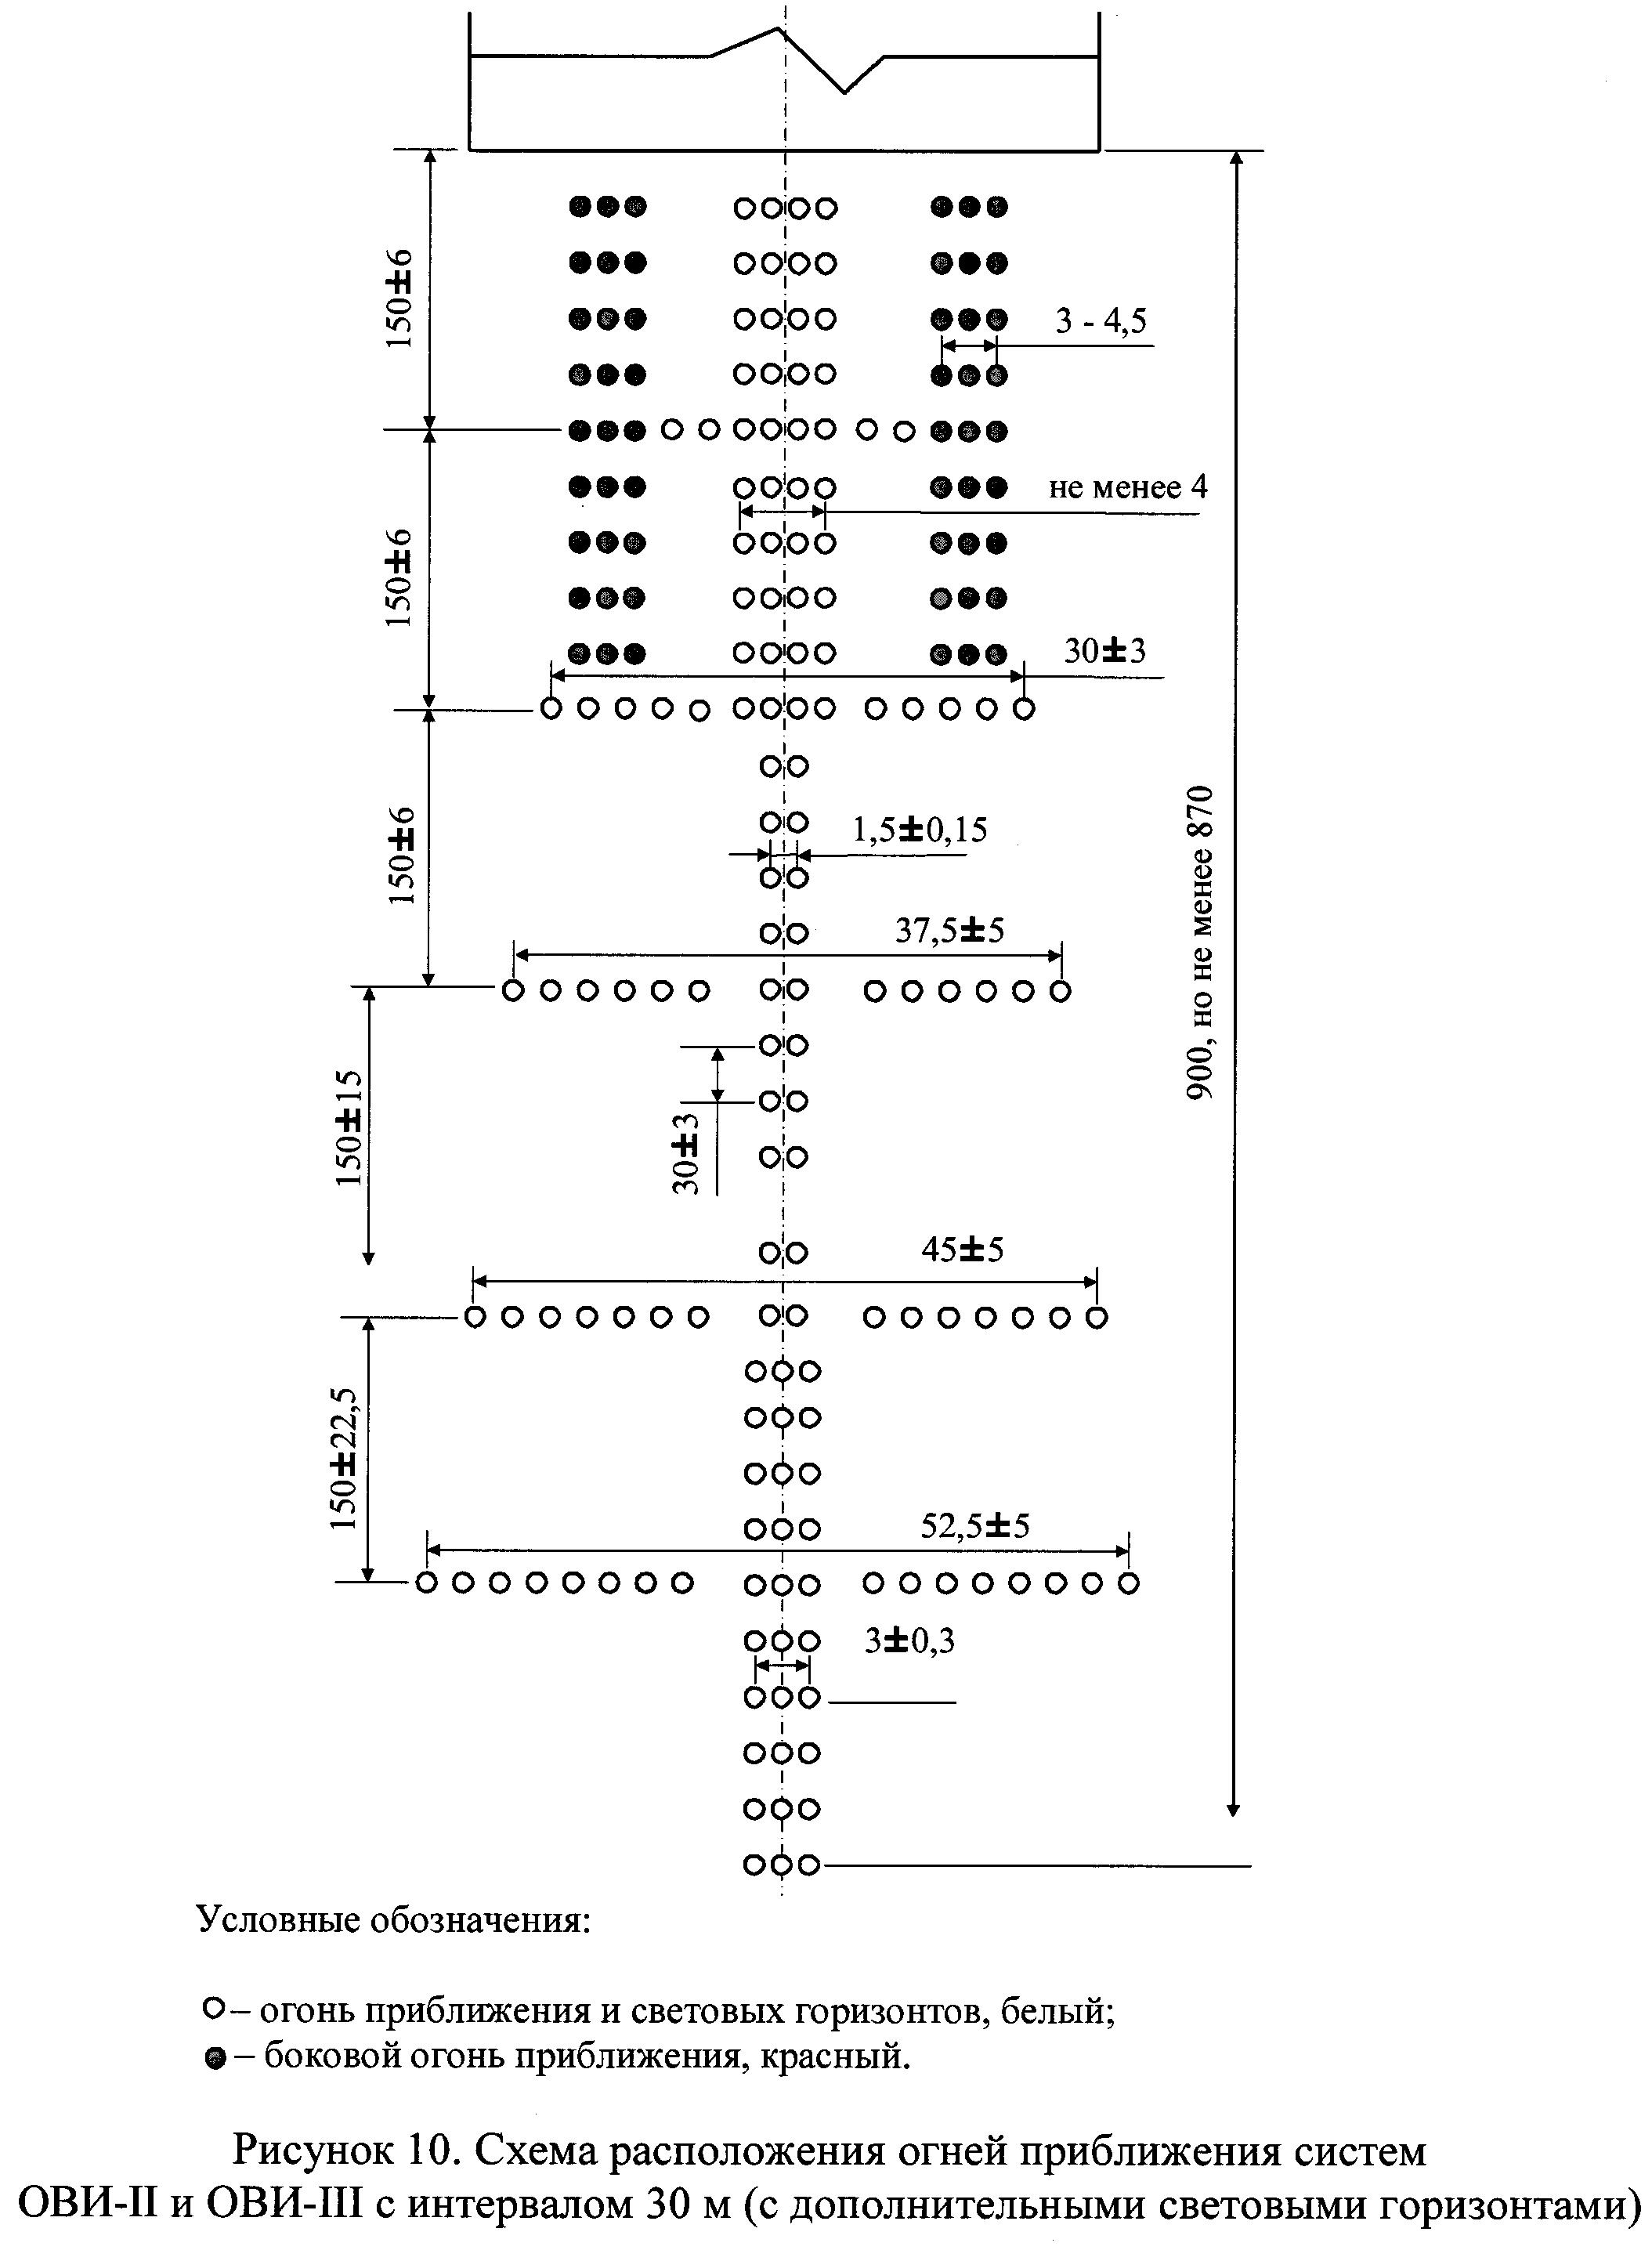 РИС. 10. ОВИ-II ОВИ-III (К ПРИКАЗУ МИНТРАНСА ОТ 25.08.2015 N262)